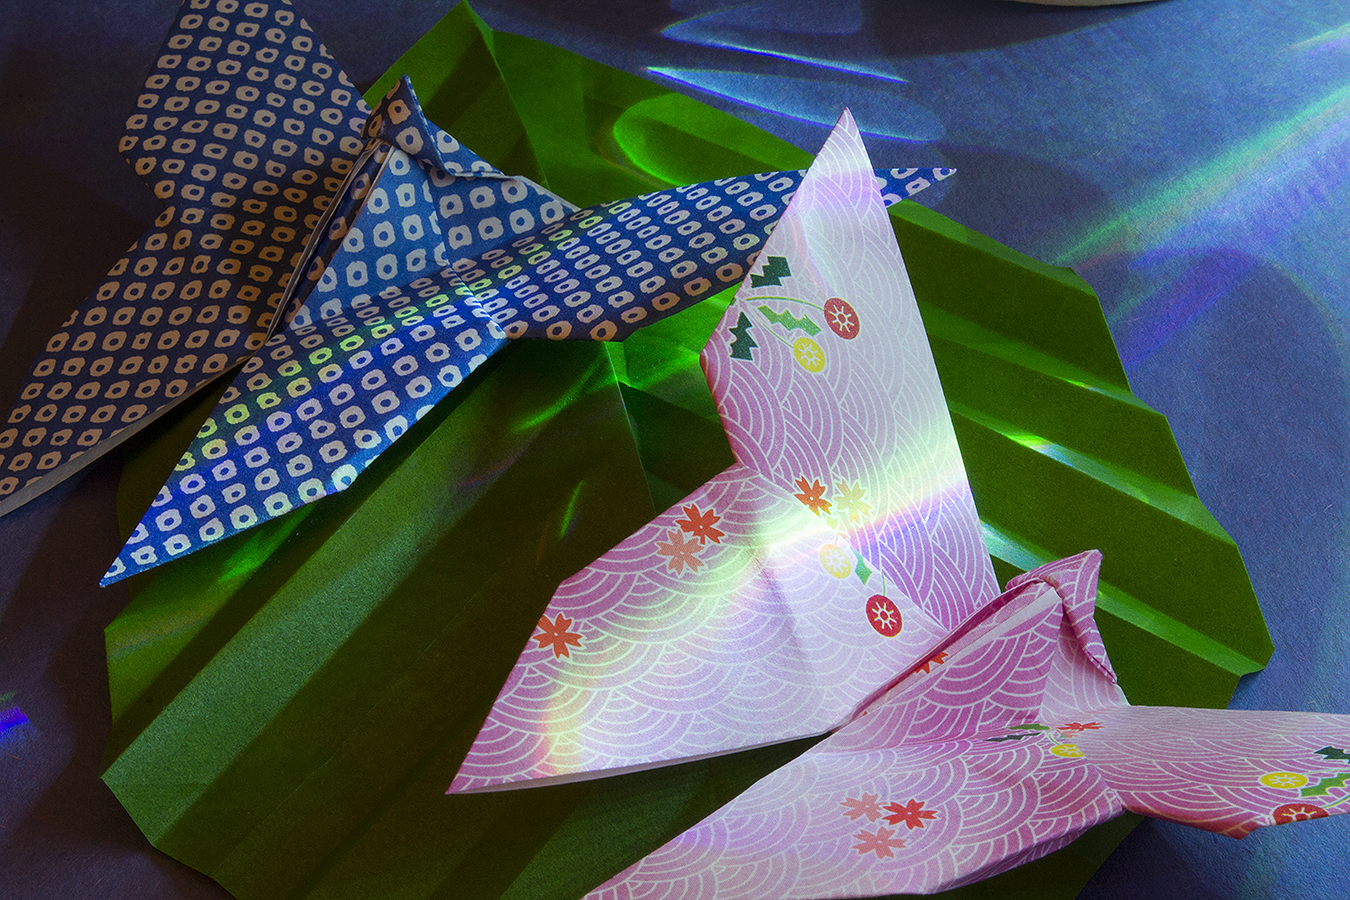 18_Butterflies_Jonathan_Tang_UPenn_Tony_Ward_Studio_Long_Exposure_Low_Light_LED_Optics_Origami_Paper_Leaf